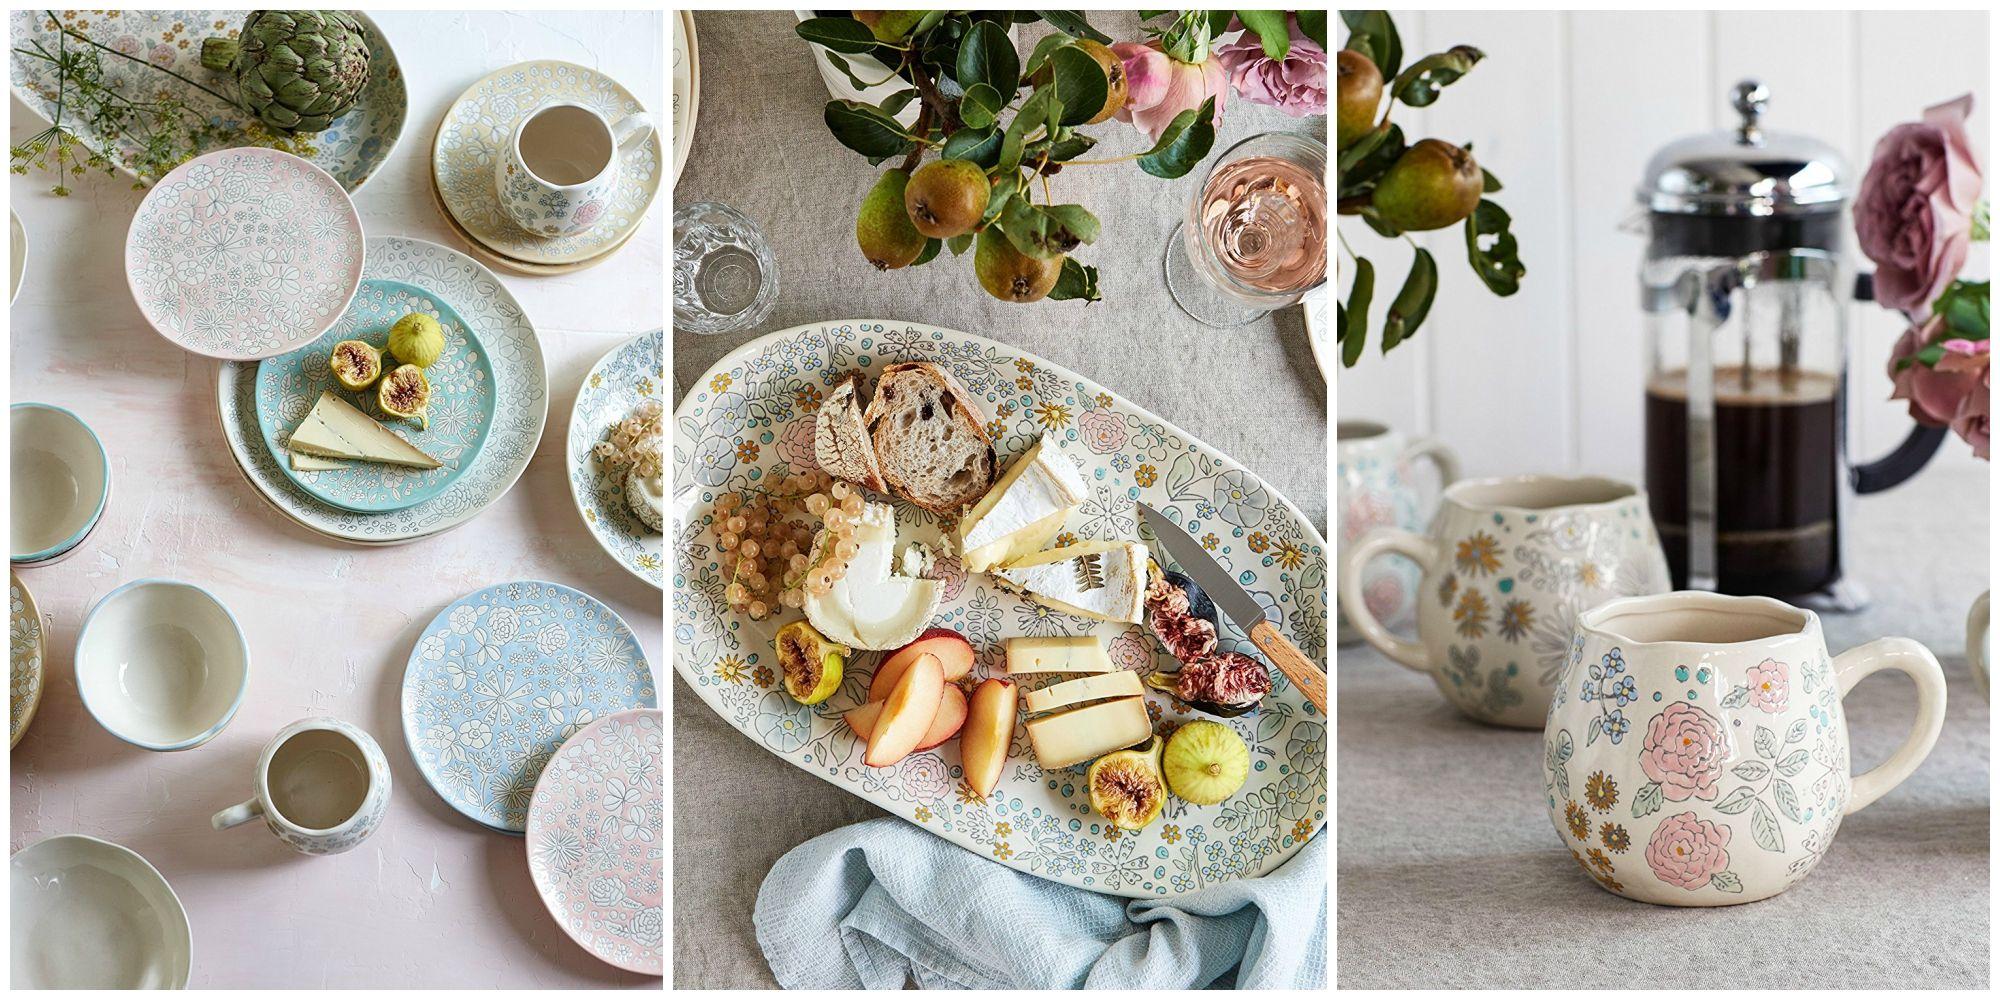 amazon dorotea dinnerware collection & Amazon New Dishware Collection - Dorotea Collection On Amazon